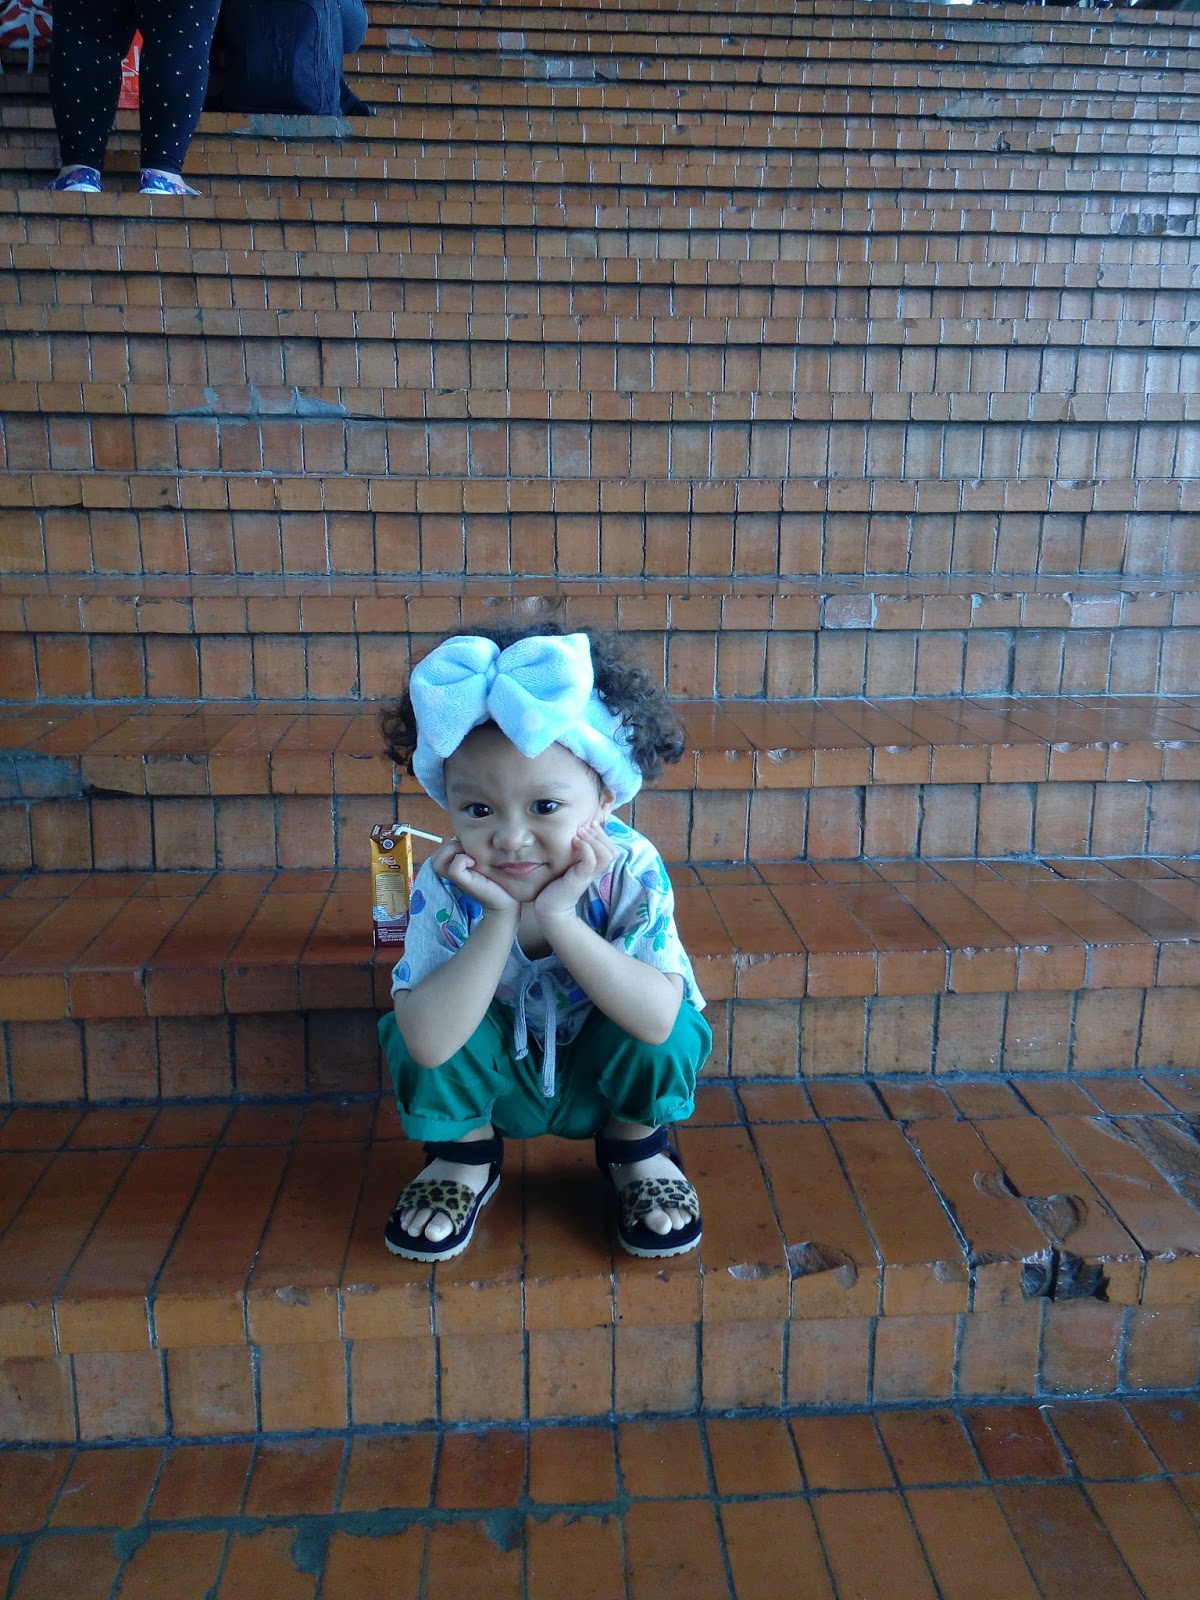 Anak Kecil Ini Bikin Gw Selalu Pengen Balik Ke Rumah Cepet Mana Inget Dia Andai Keadaan Memungkinkan Pengeeen Banget Bawa